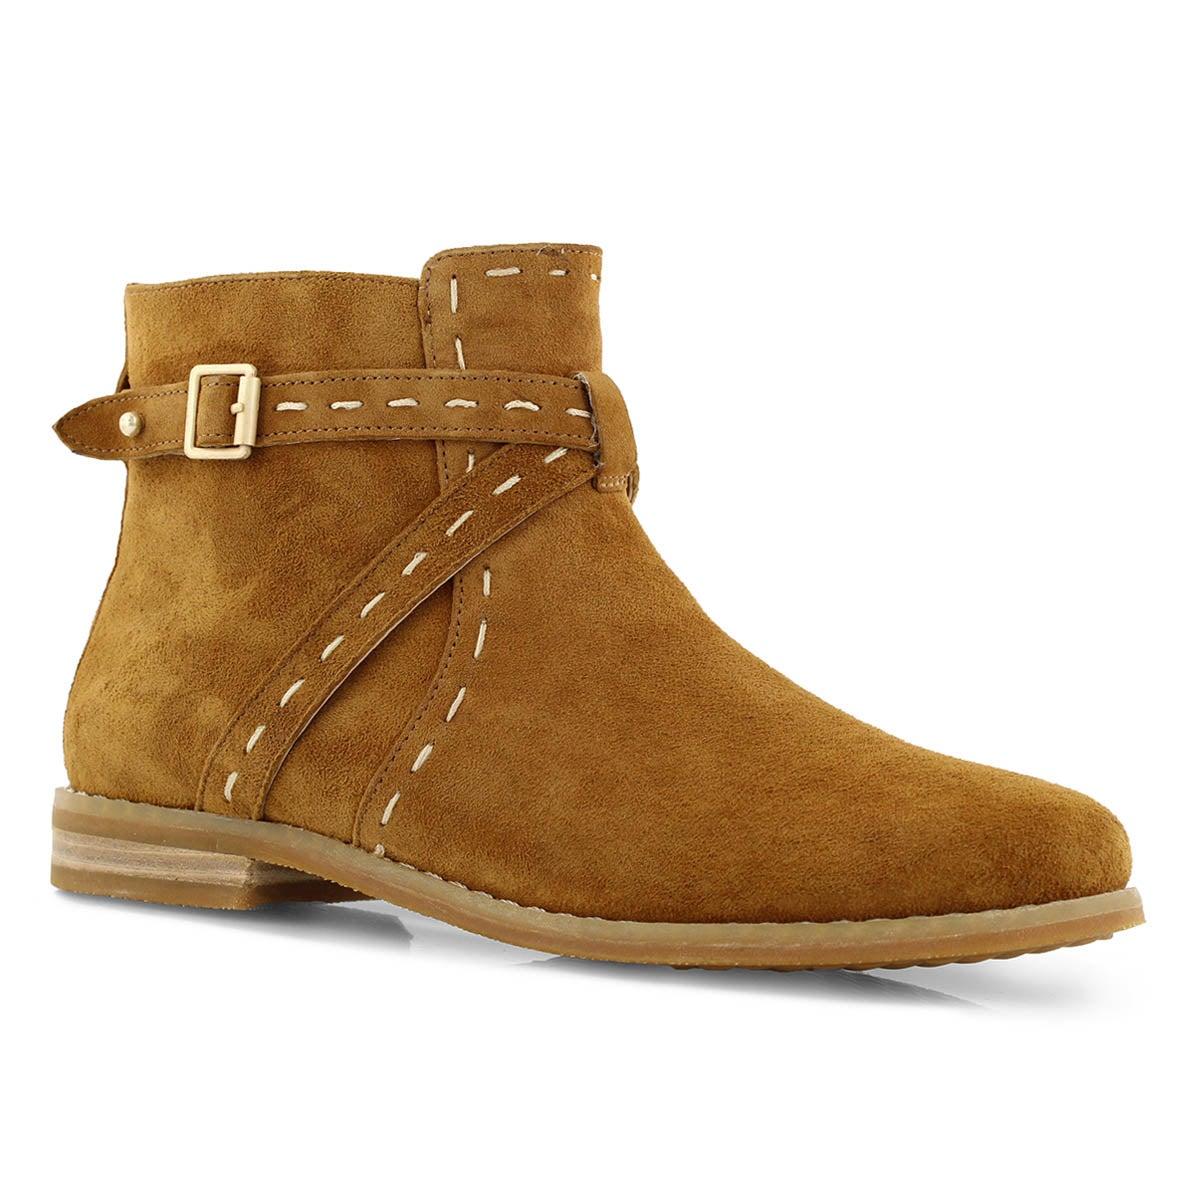 Lds Chardon Belt camel casual ankle boot